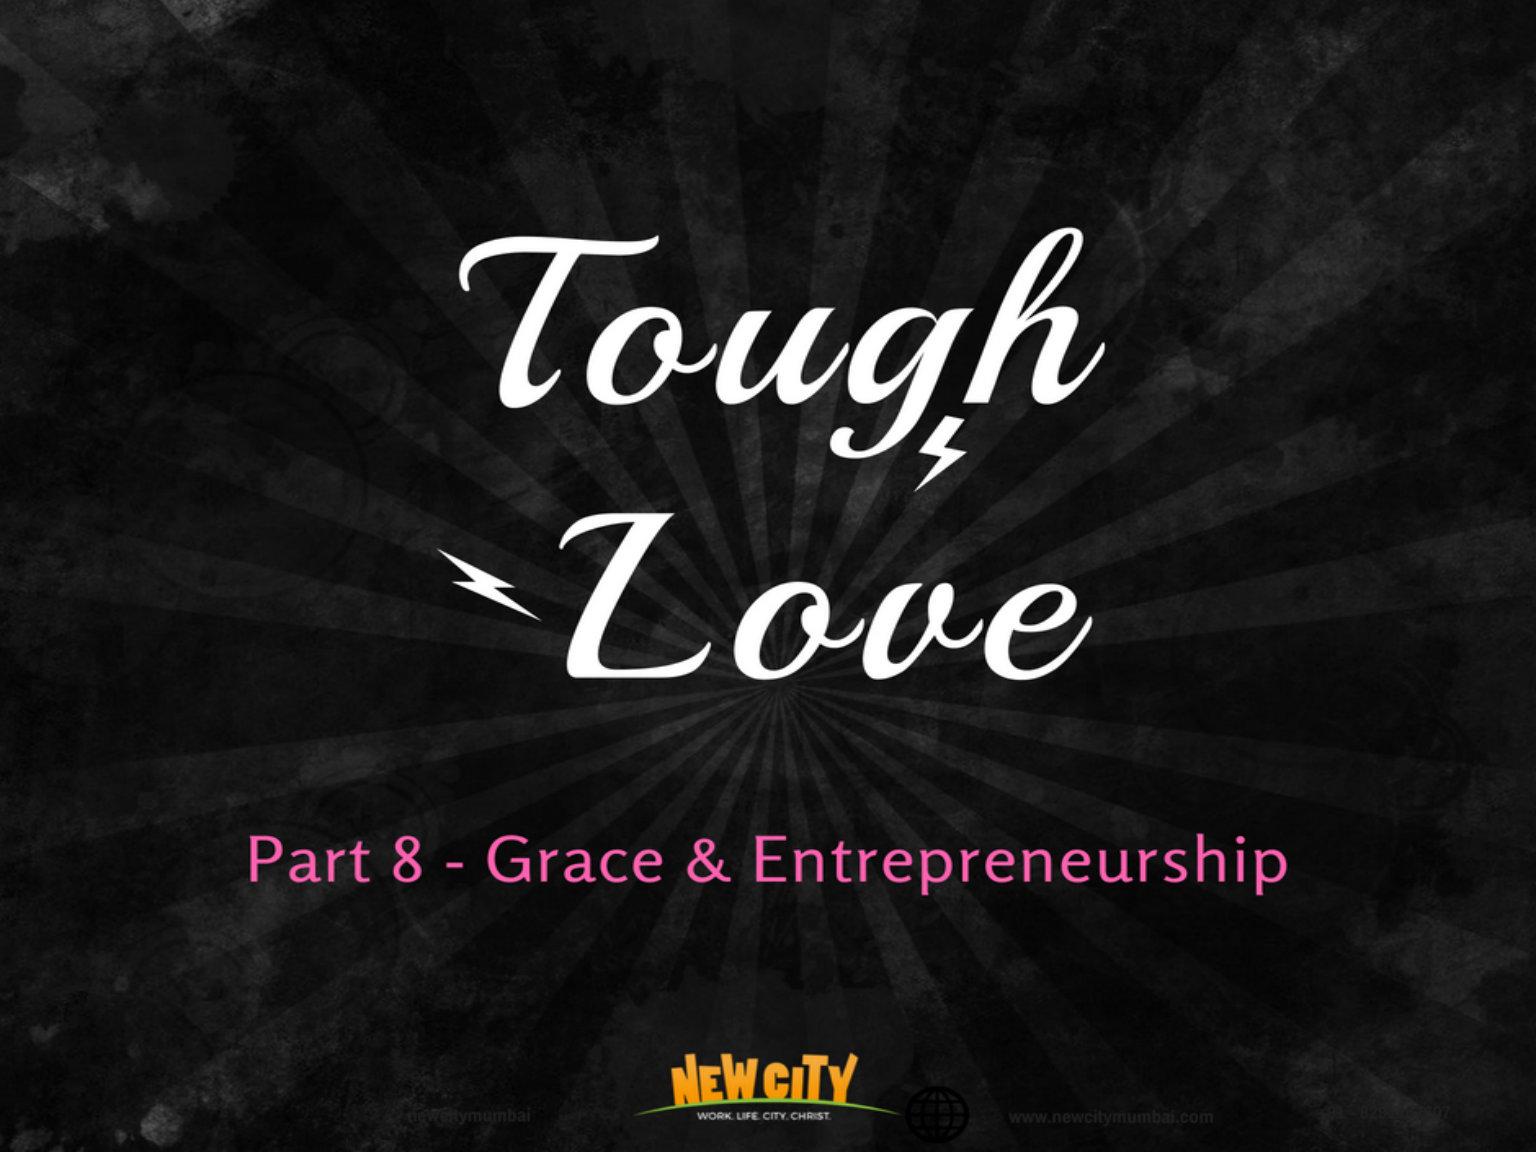 Grace and Entrepreneurship Image